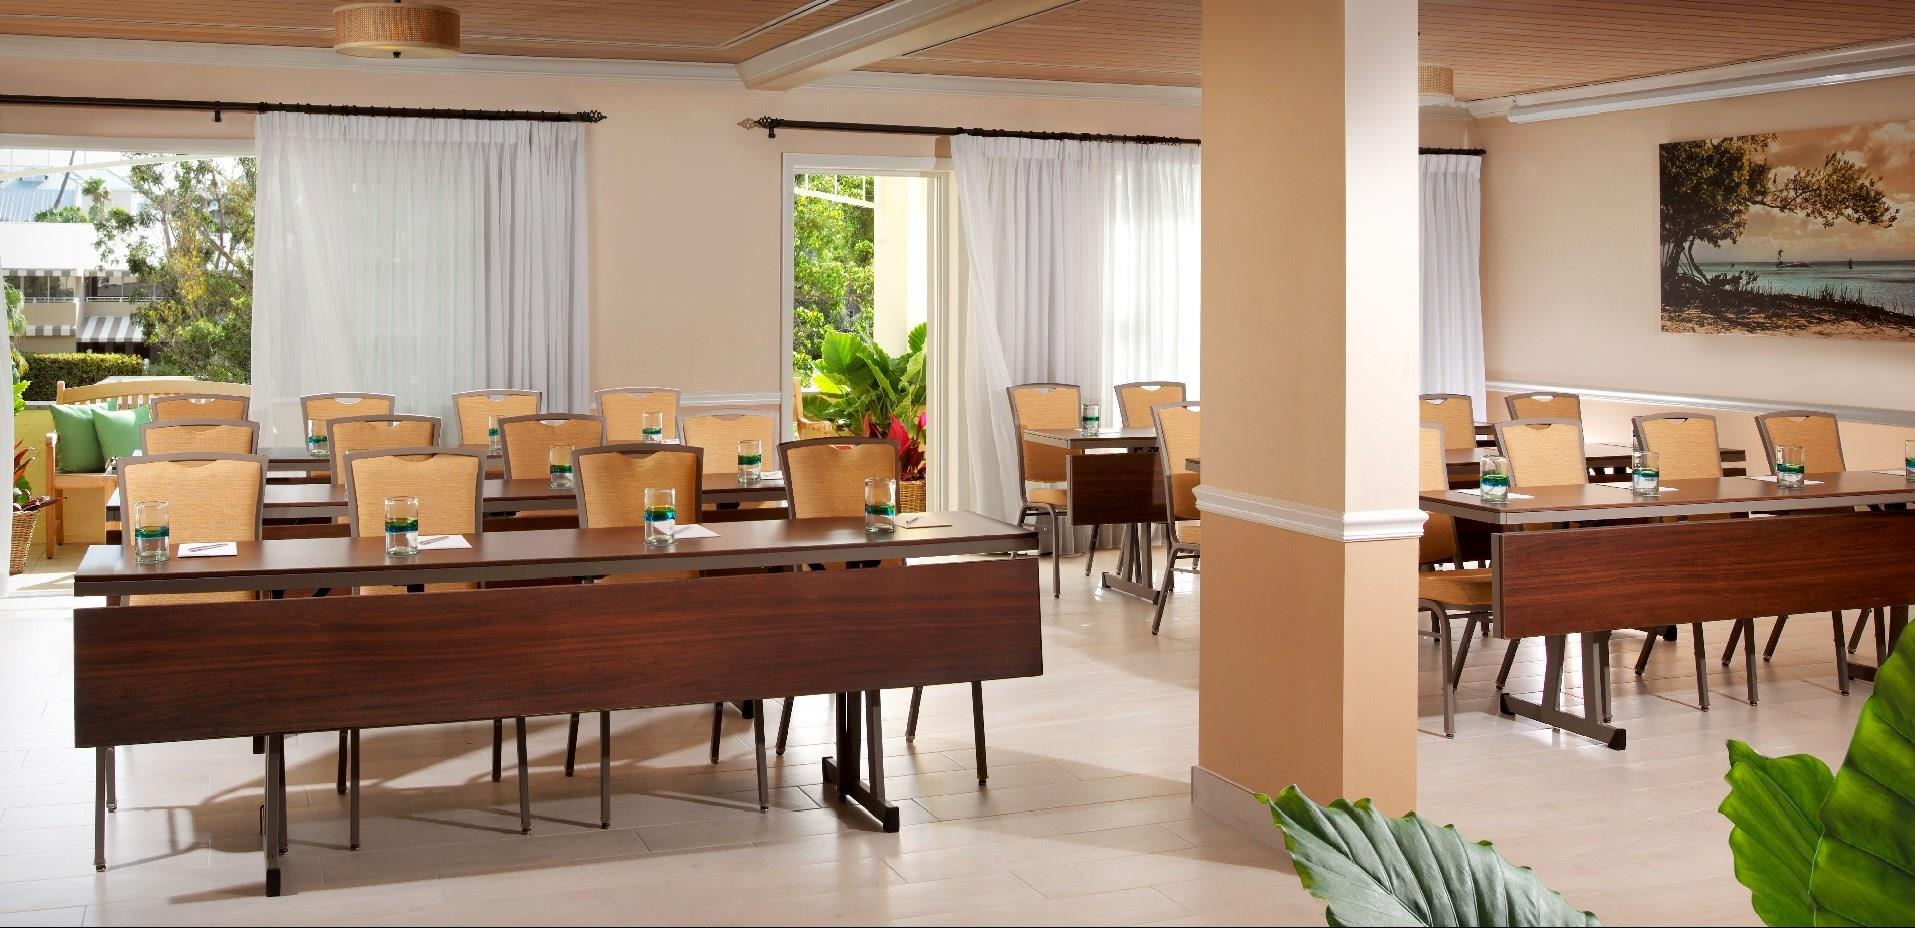 Meetings and Events at Ocean Key Resort & Spa, Key West, FL, US